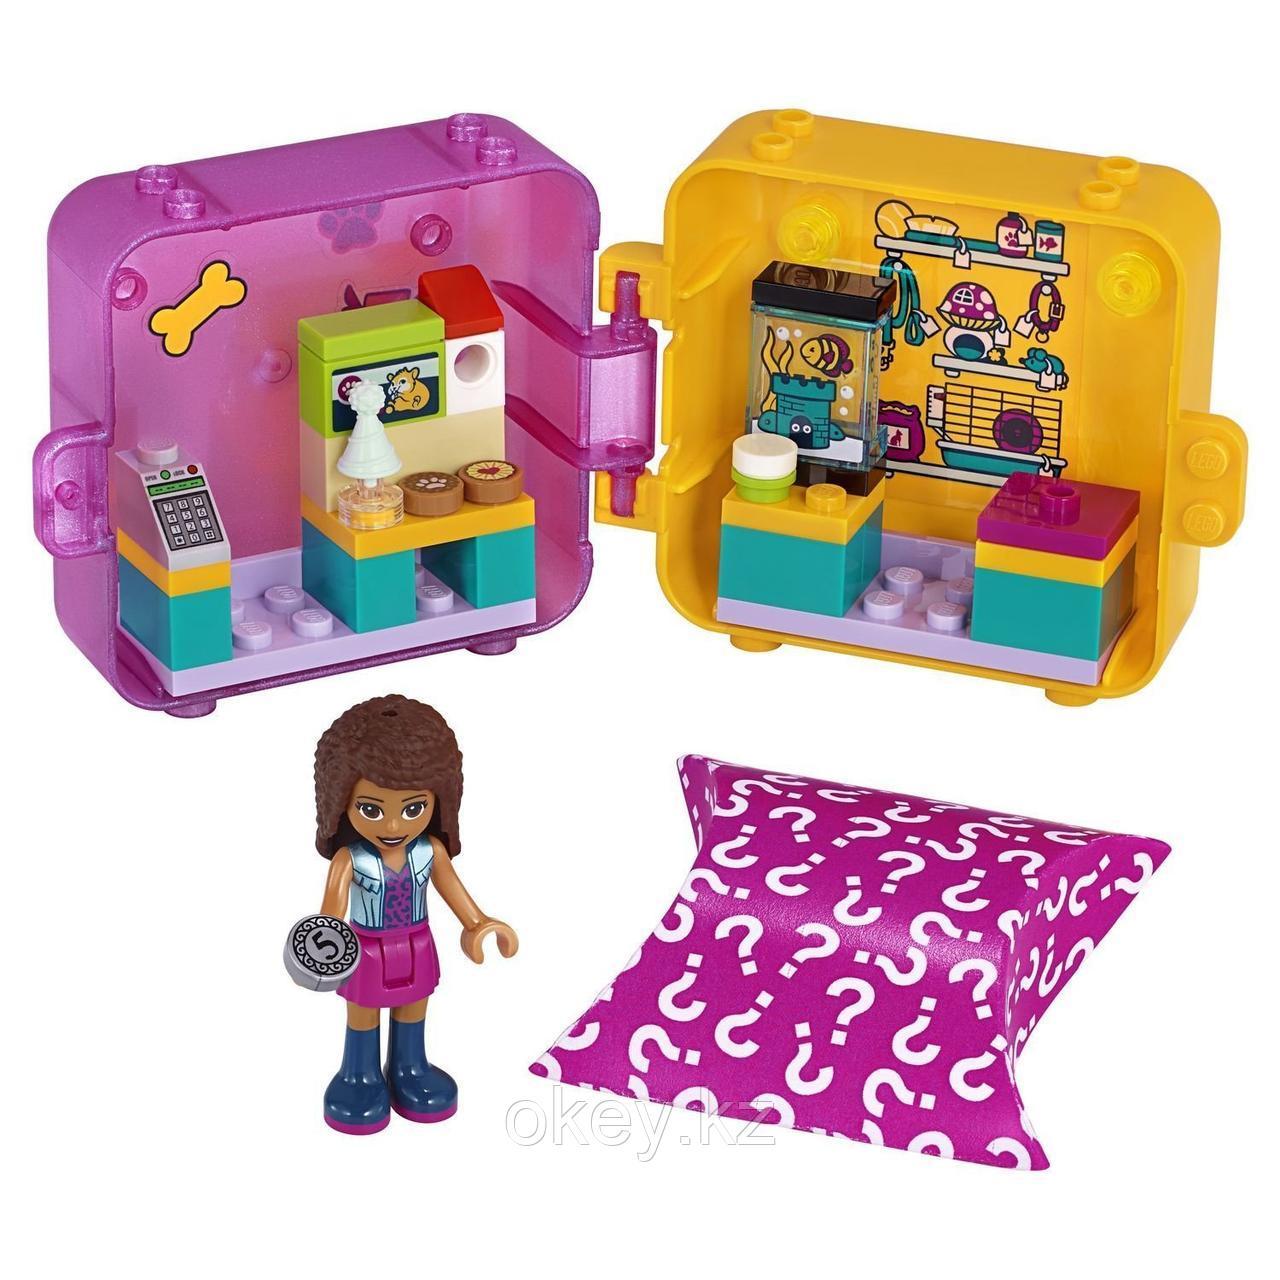 LEGO Friends: Игровая шкатулка Покупки Андреа 41405 - фото 2